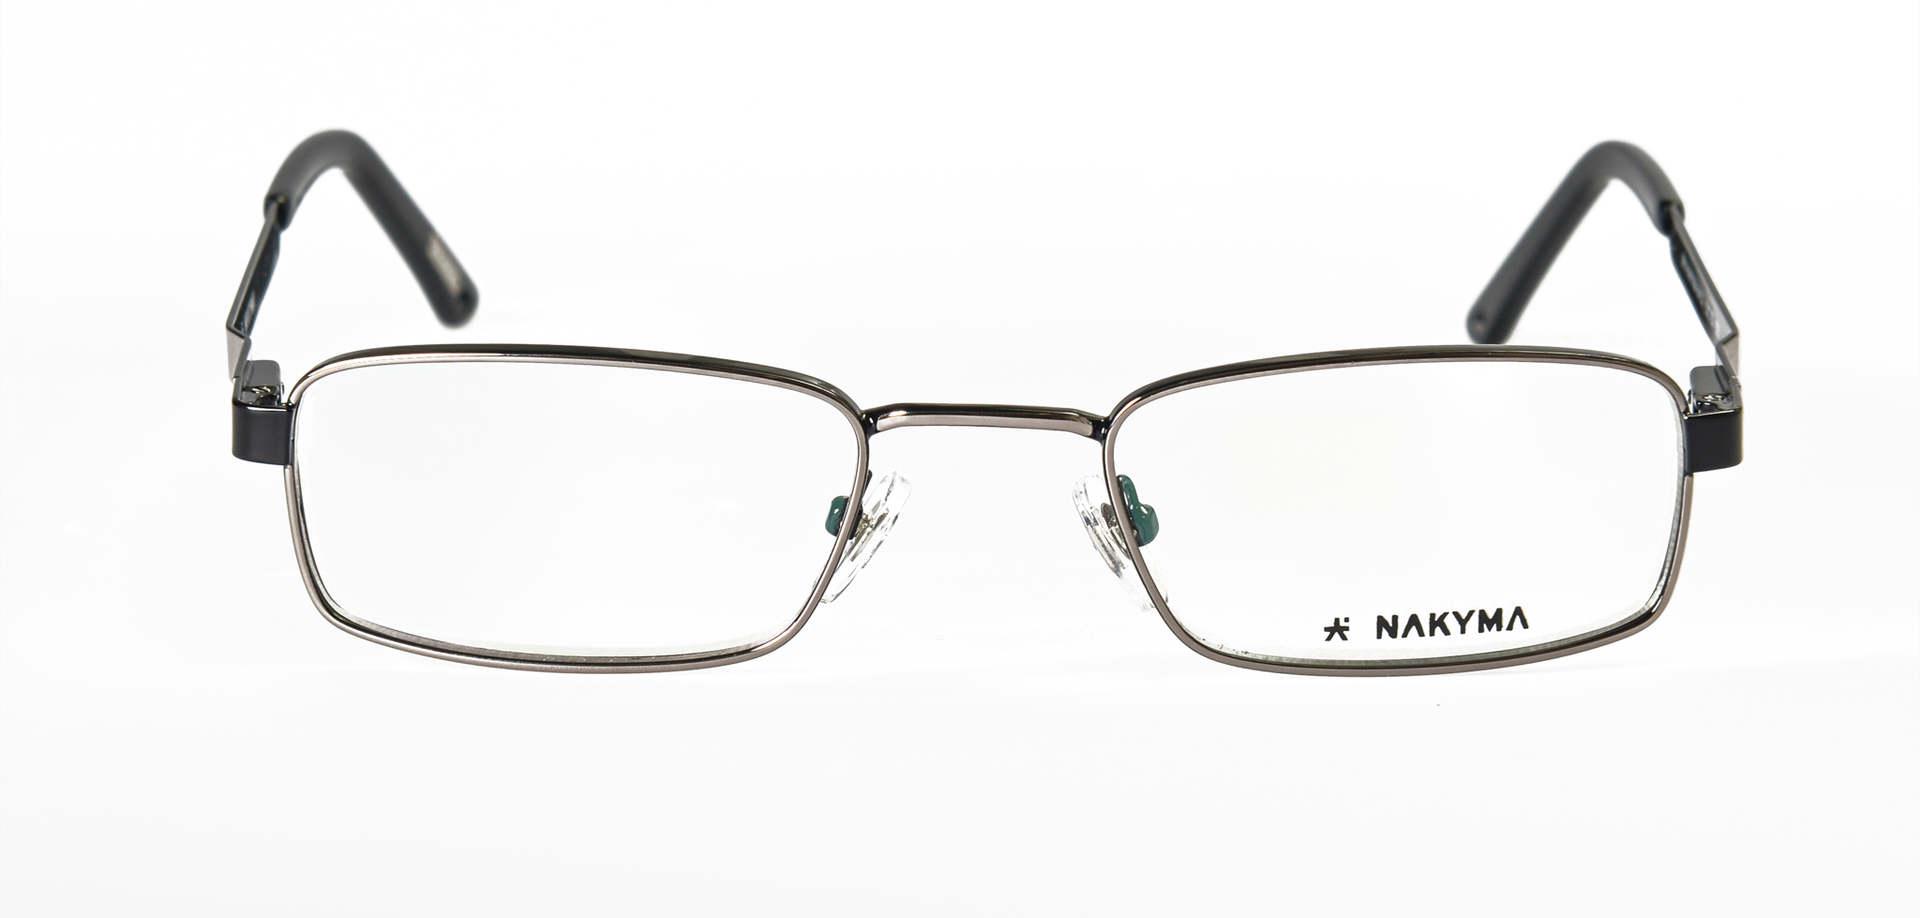 8R1-NAKYMA-04 C1